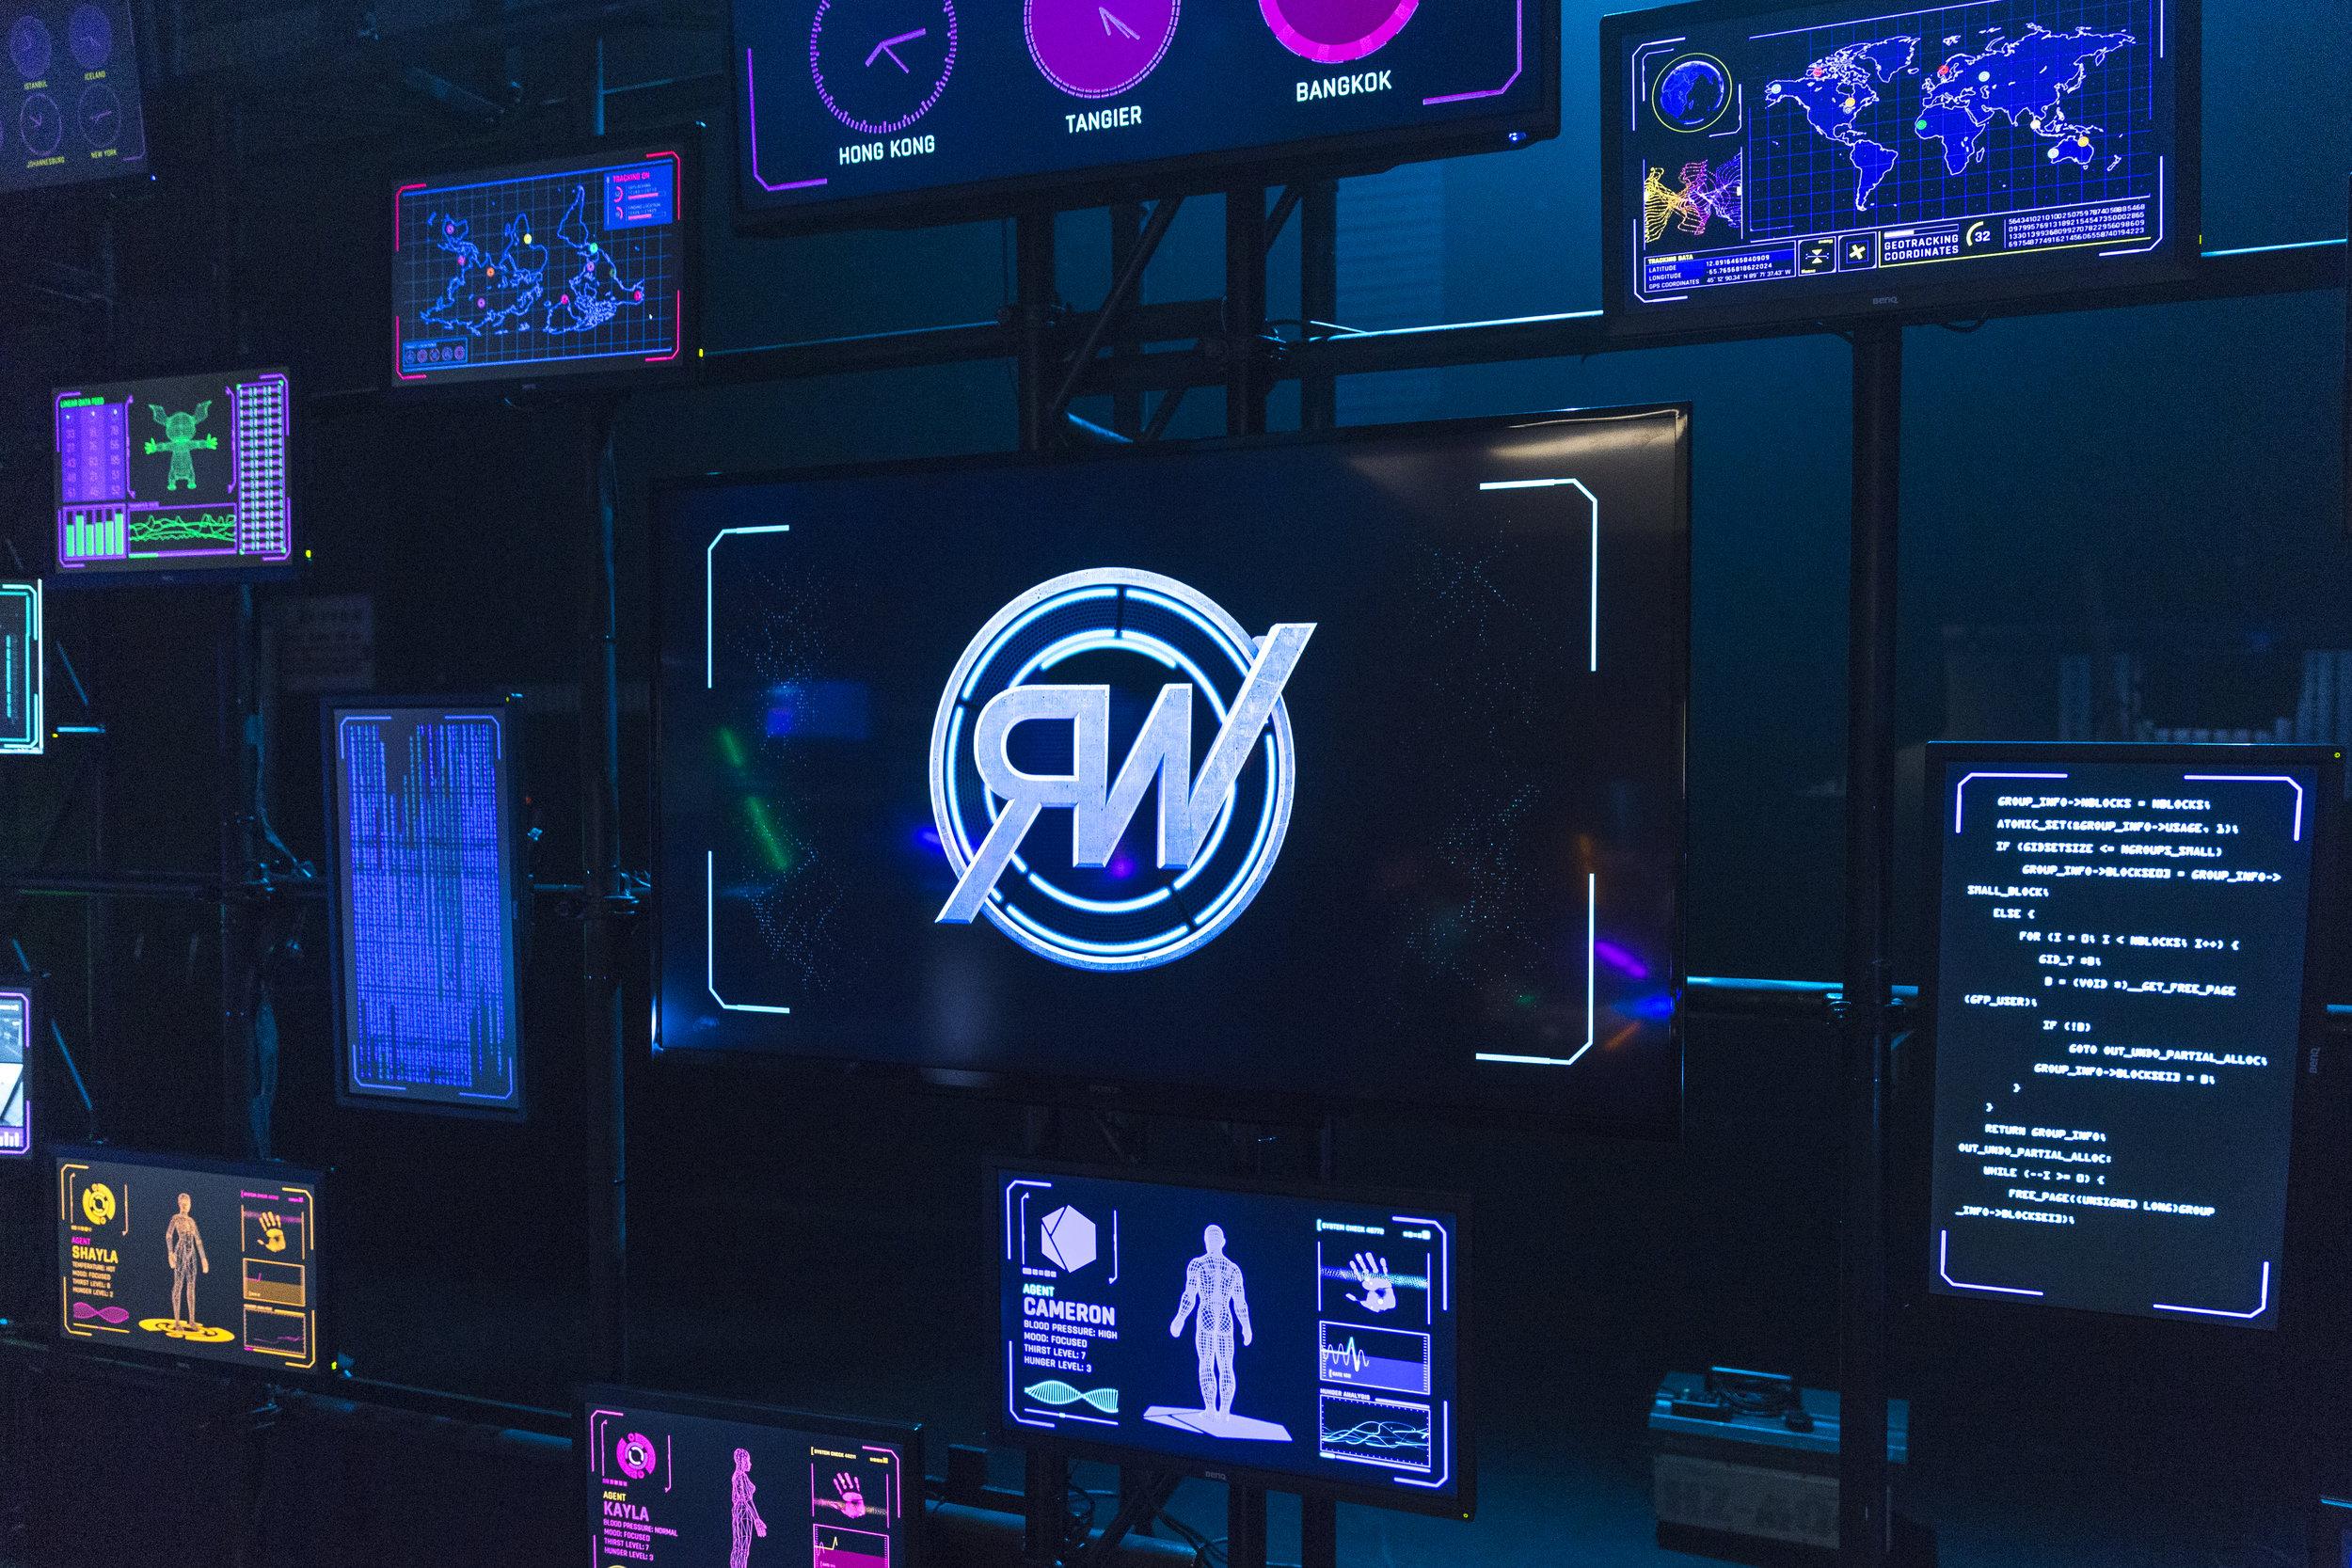 RW_Production Stills-Bunker_0096_Publicity.jpg